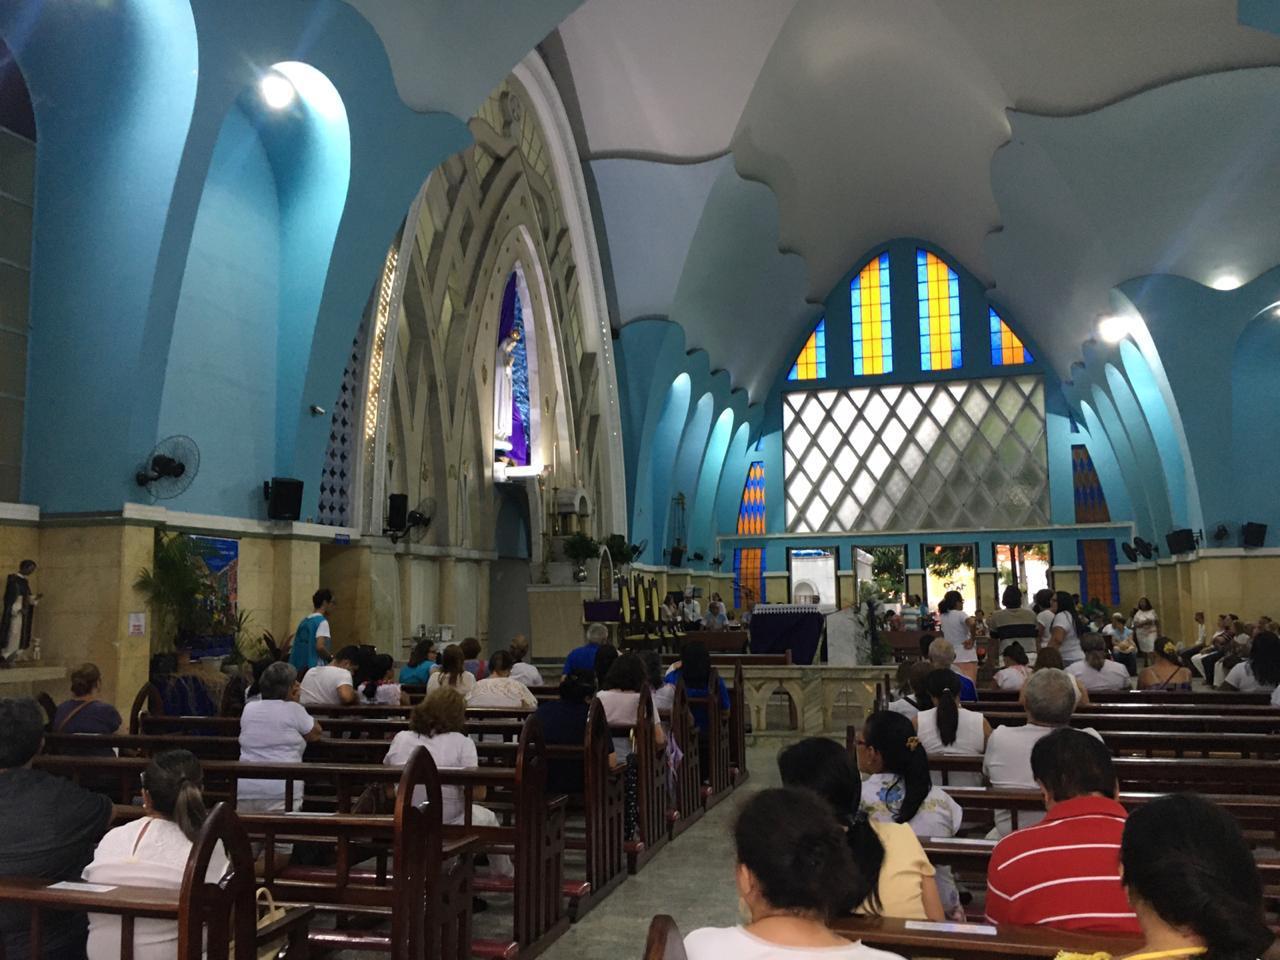 Medo do coronavírus esvazia missa do dia 13 na Igreja de Fátima